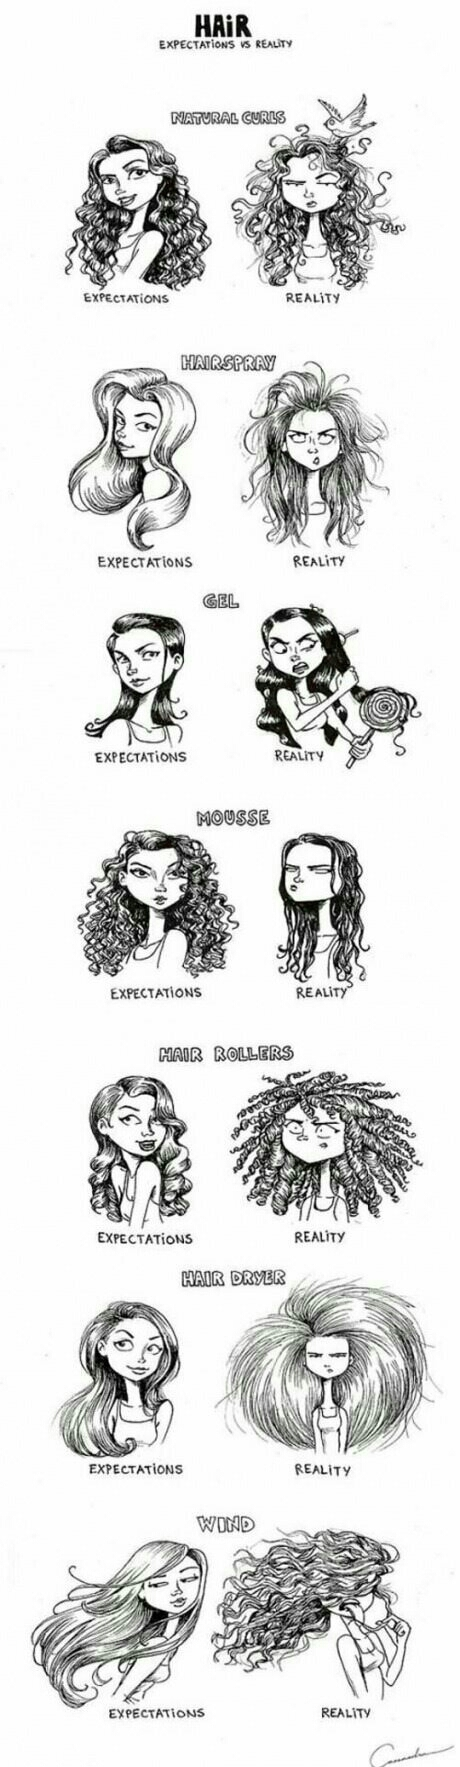 The Best Hair Memes Memedroid